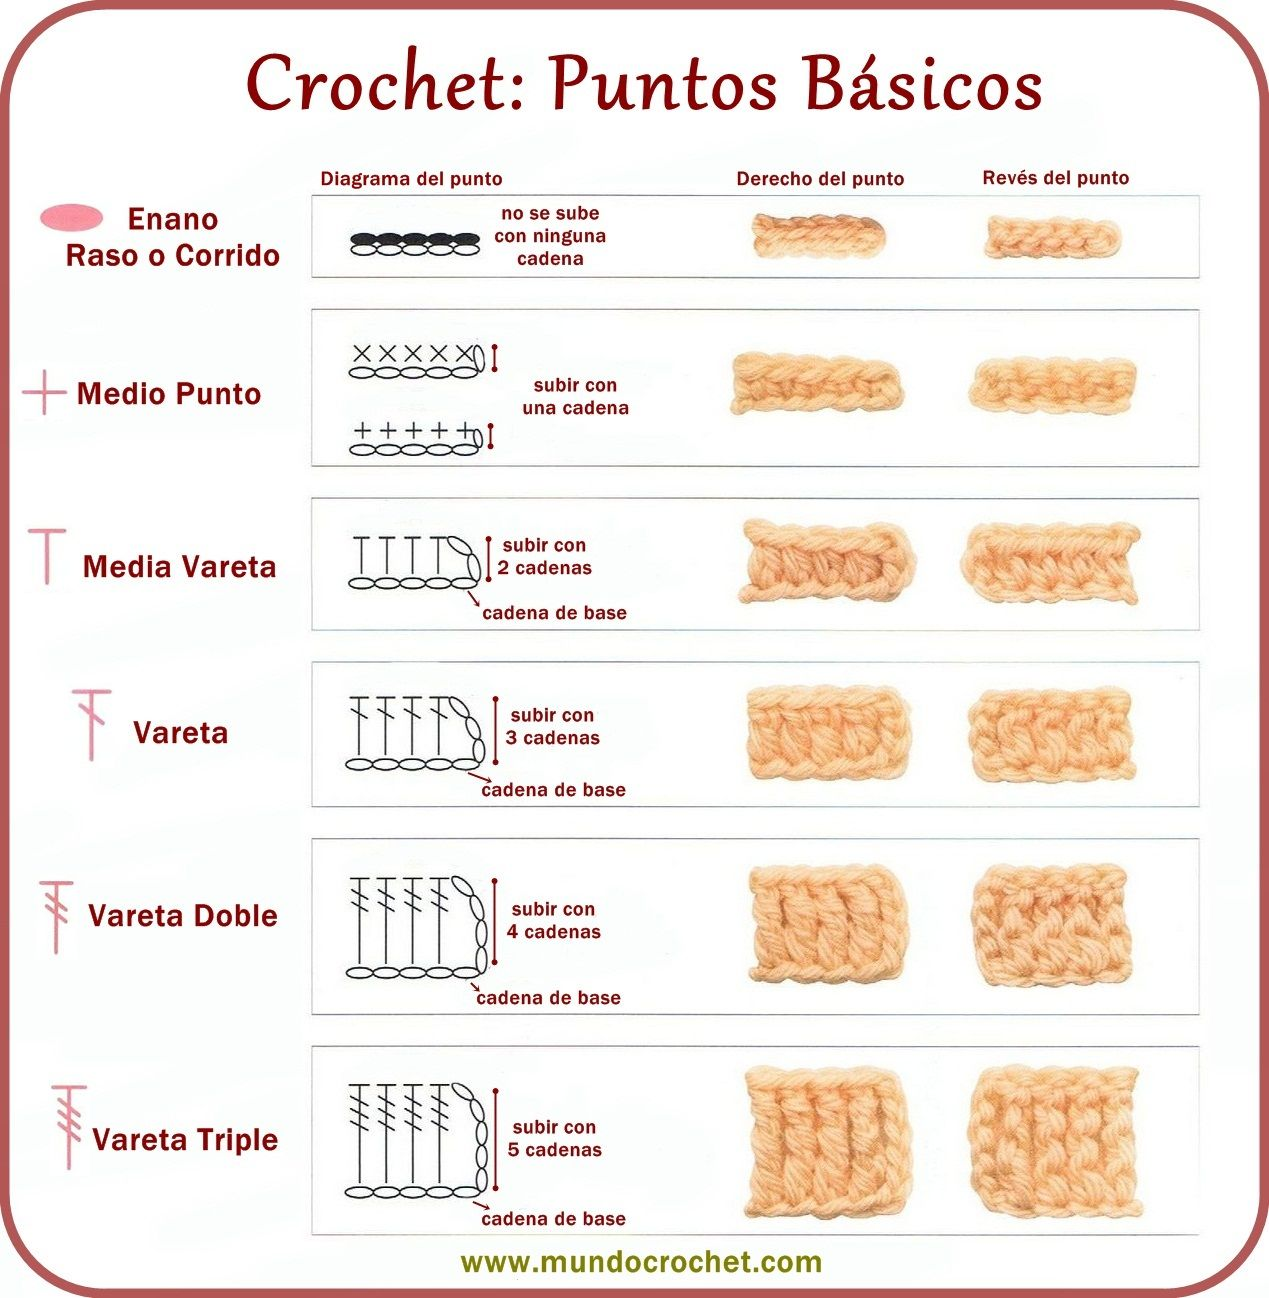 Crochet puntos basicos | Ganchillo | Pinterest | Puntos, Ganchillo y ...